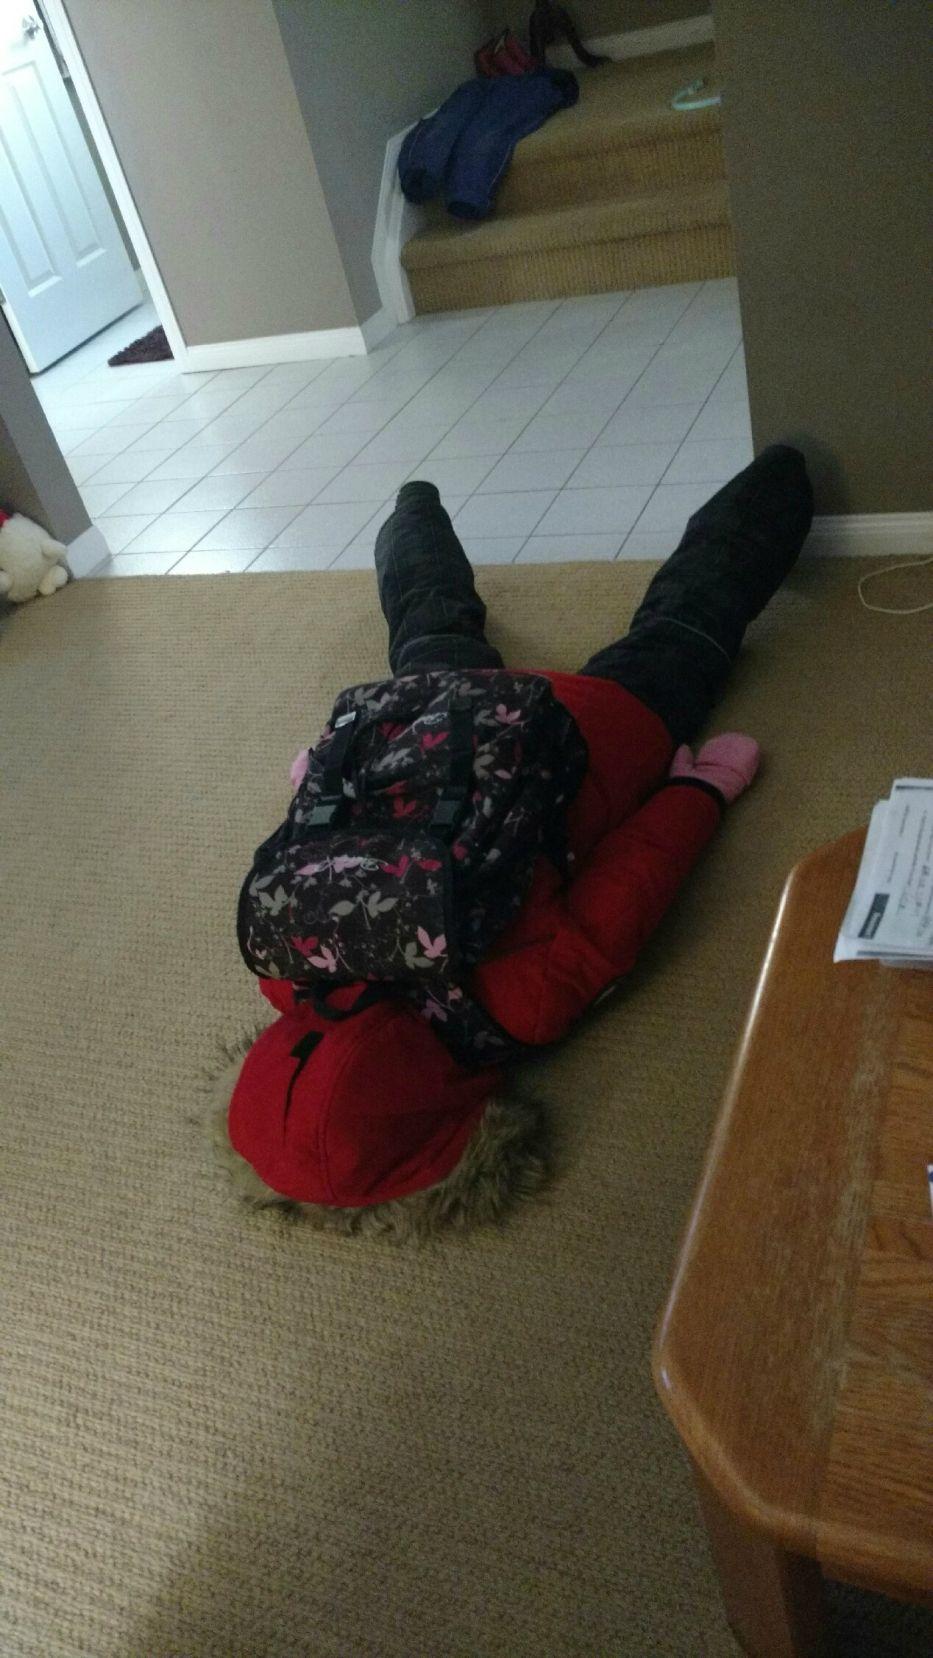 little girl face down on the floor in despair